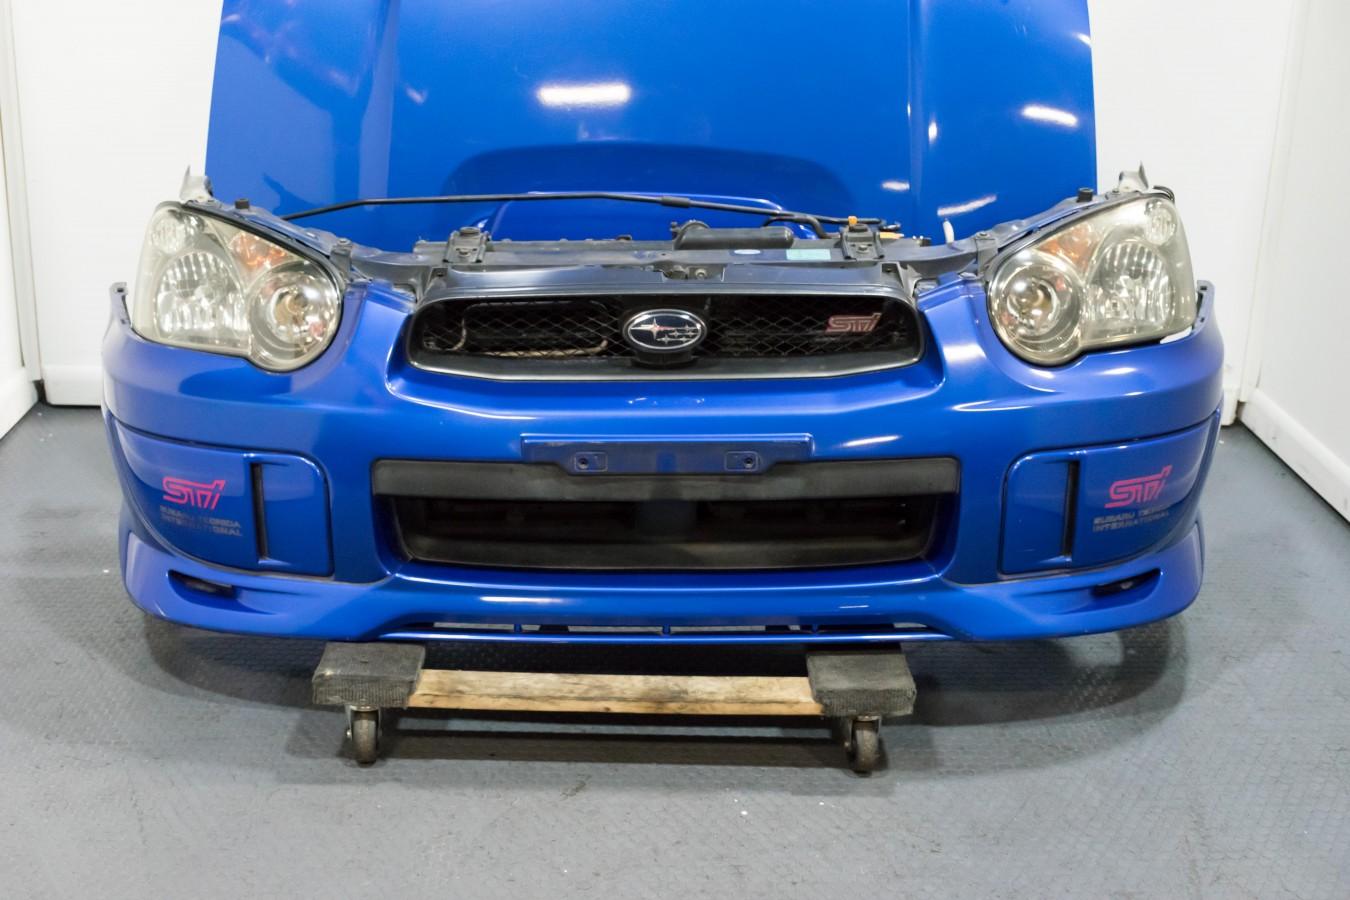 Used Subaru Wrx Sti >> Used JDM Subaru Impreza WRX Blobeye 2004 2005 Front Cut ...